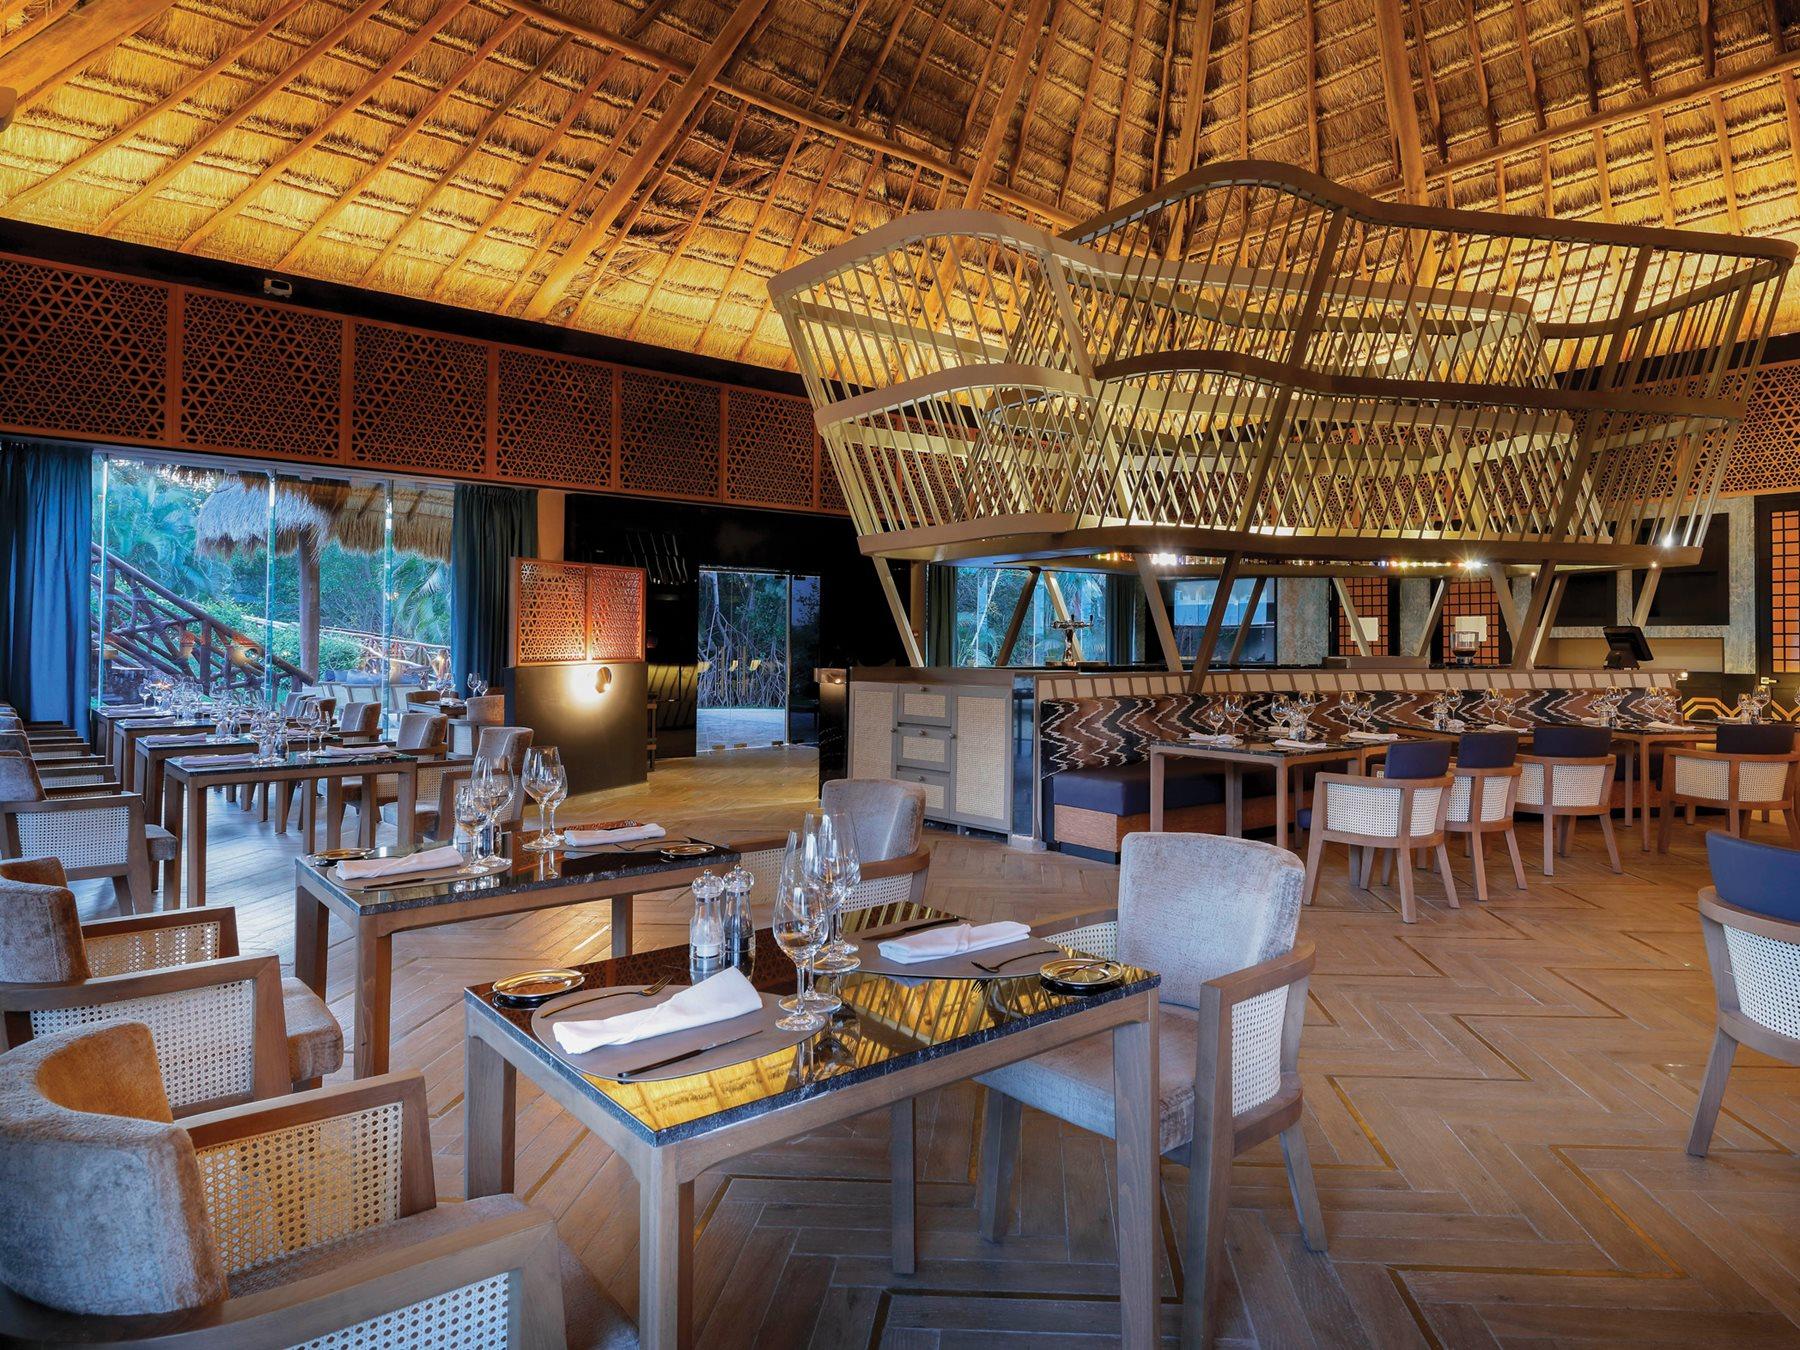 RIV-The-Royal-Suites-Yucatan-Resto-El-Gaucho-SteakHouse-001